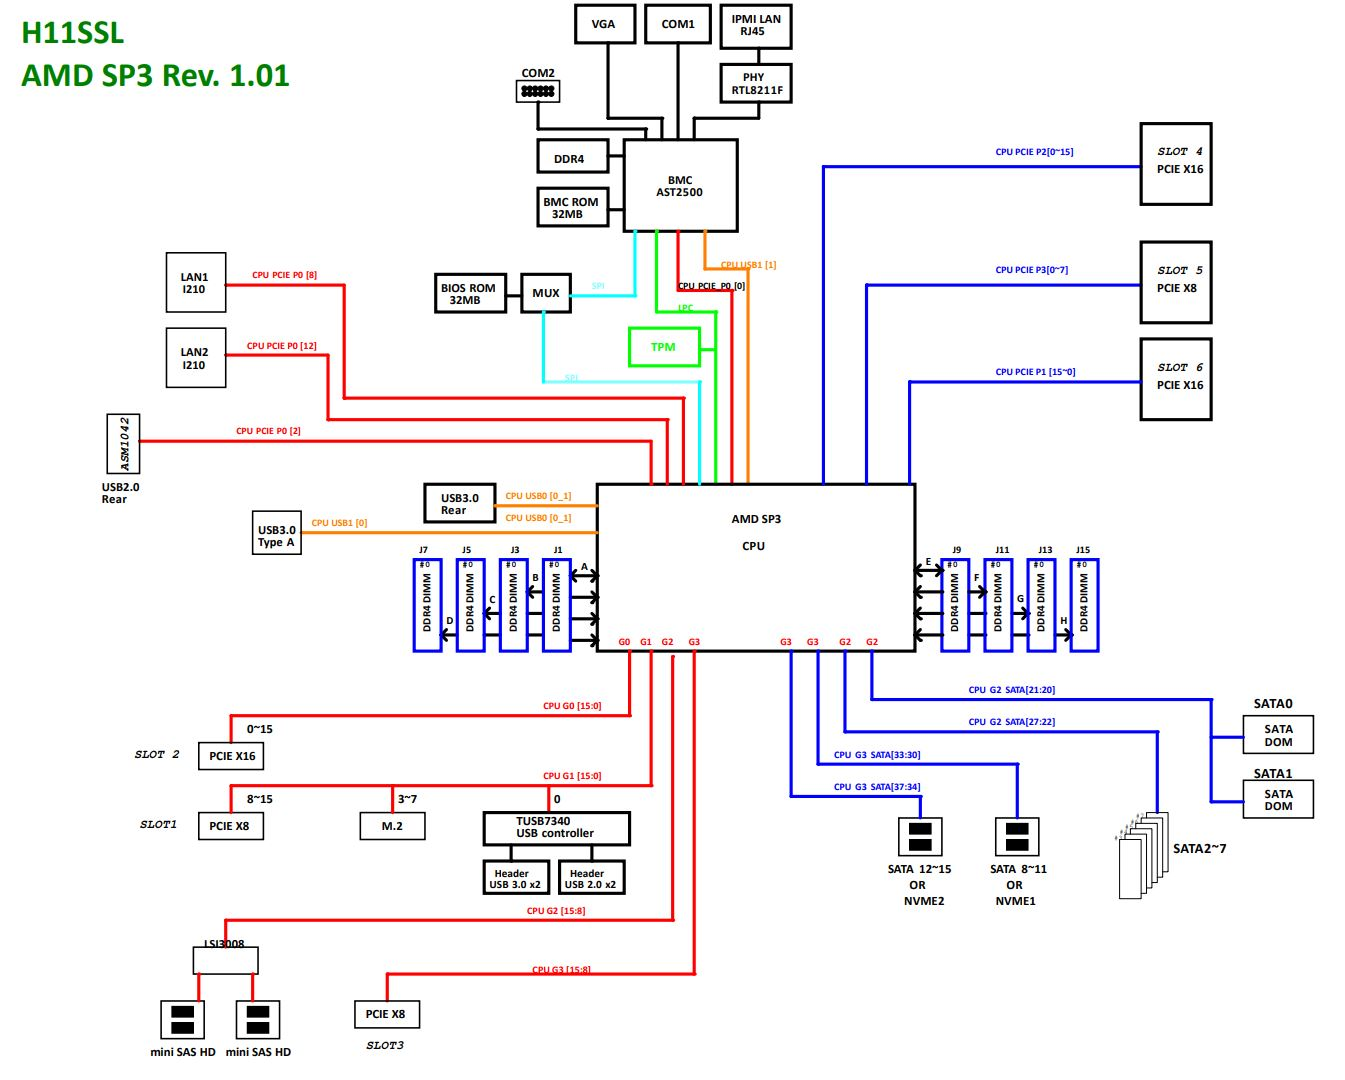 supermicro as 1013s mtr 1u 1 socket amd epyc server review. Black Bedroom Furniture Sets. Home Design Ideas